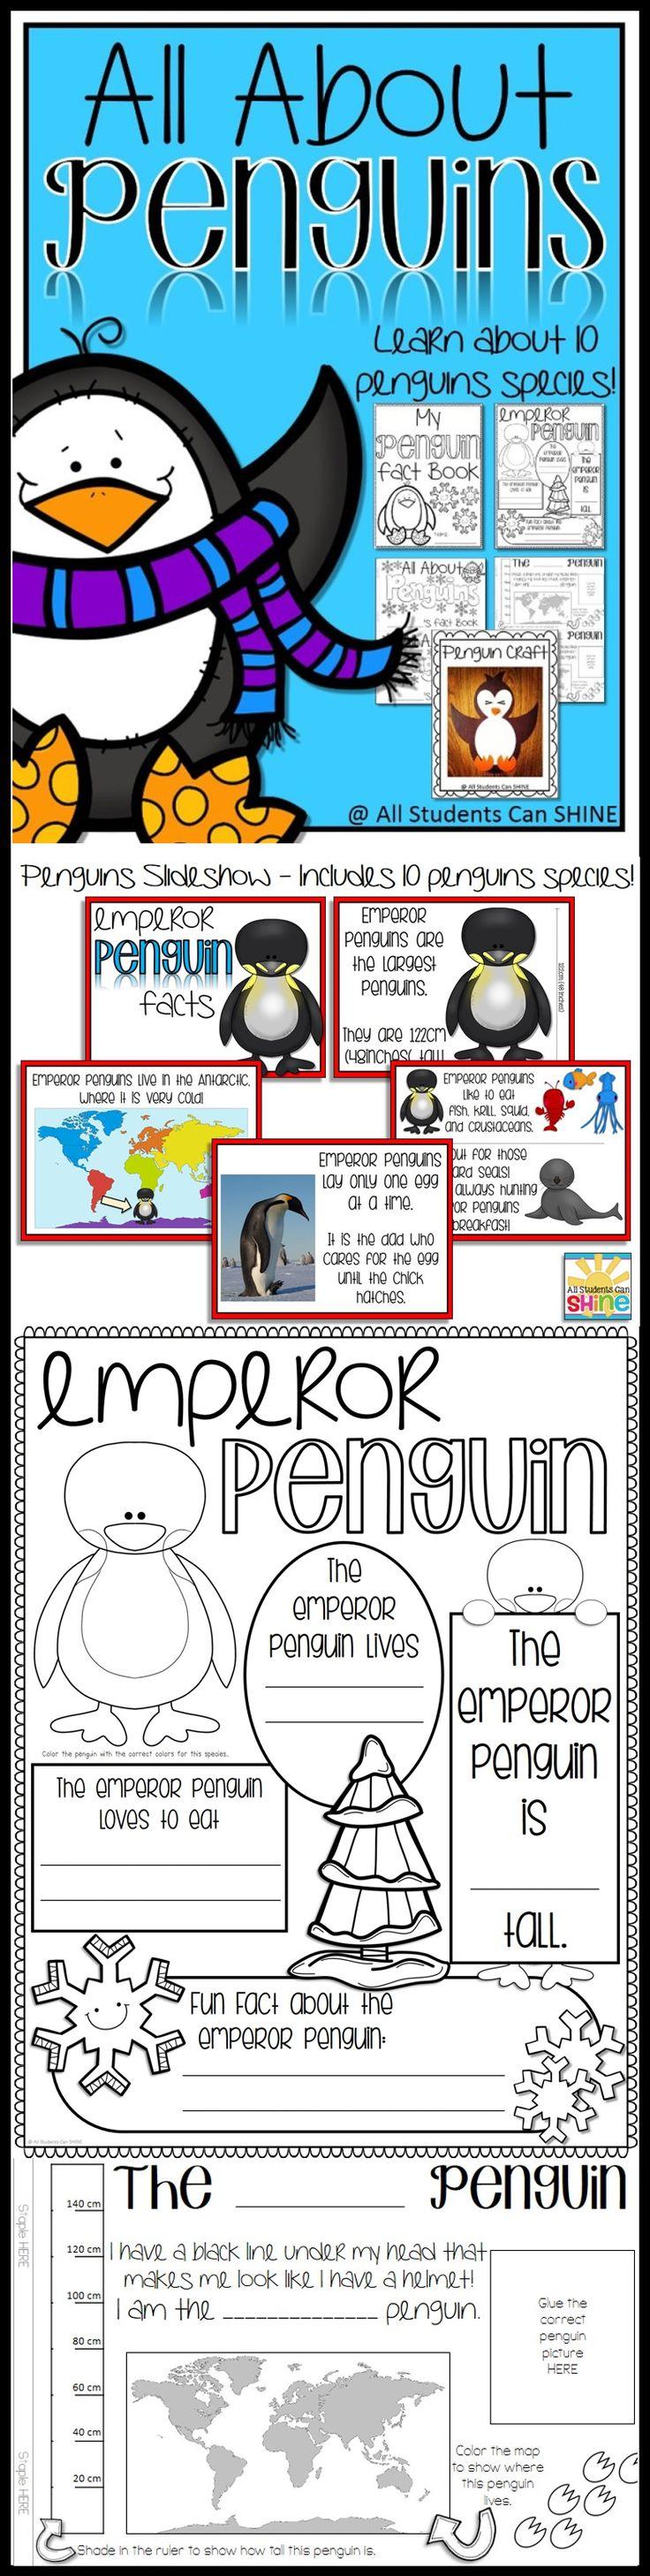 Plenty of penguin activities! I can't wait to start my penguins unit :)